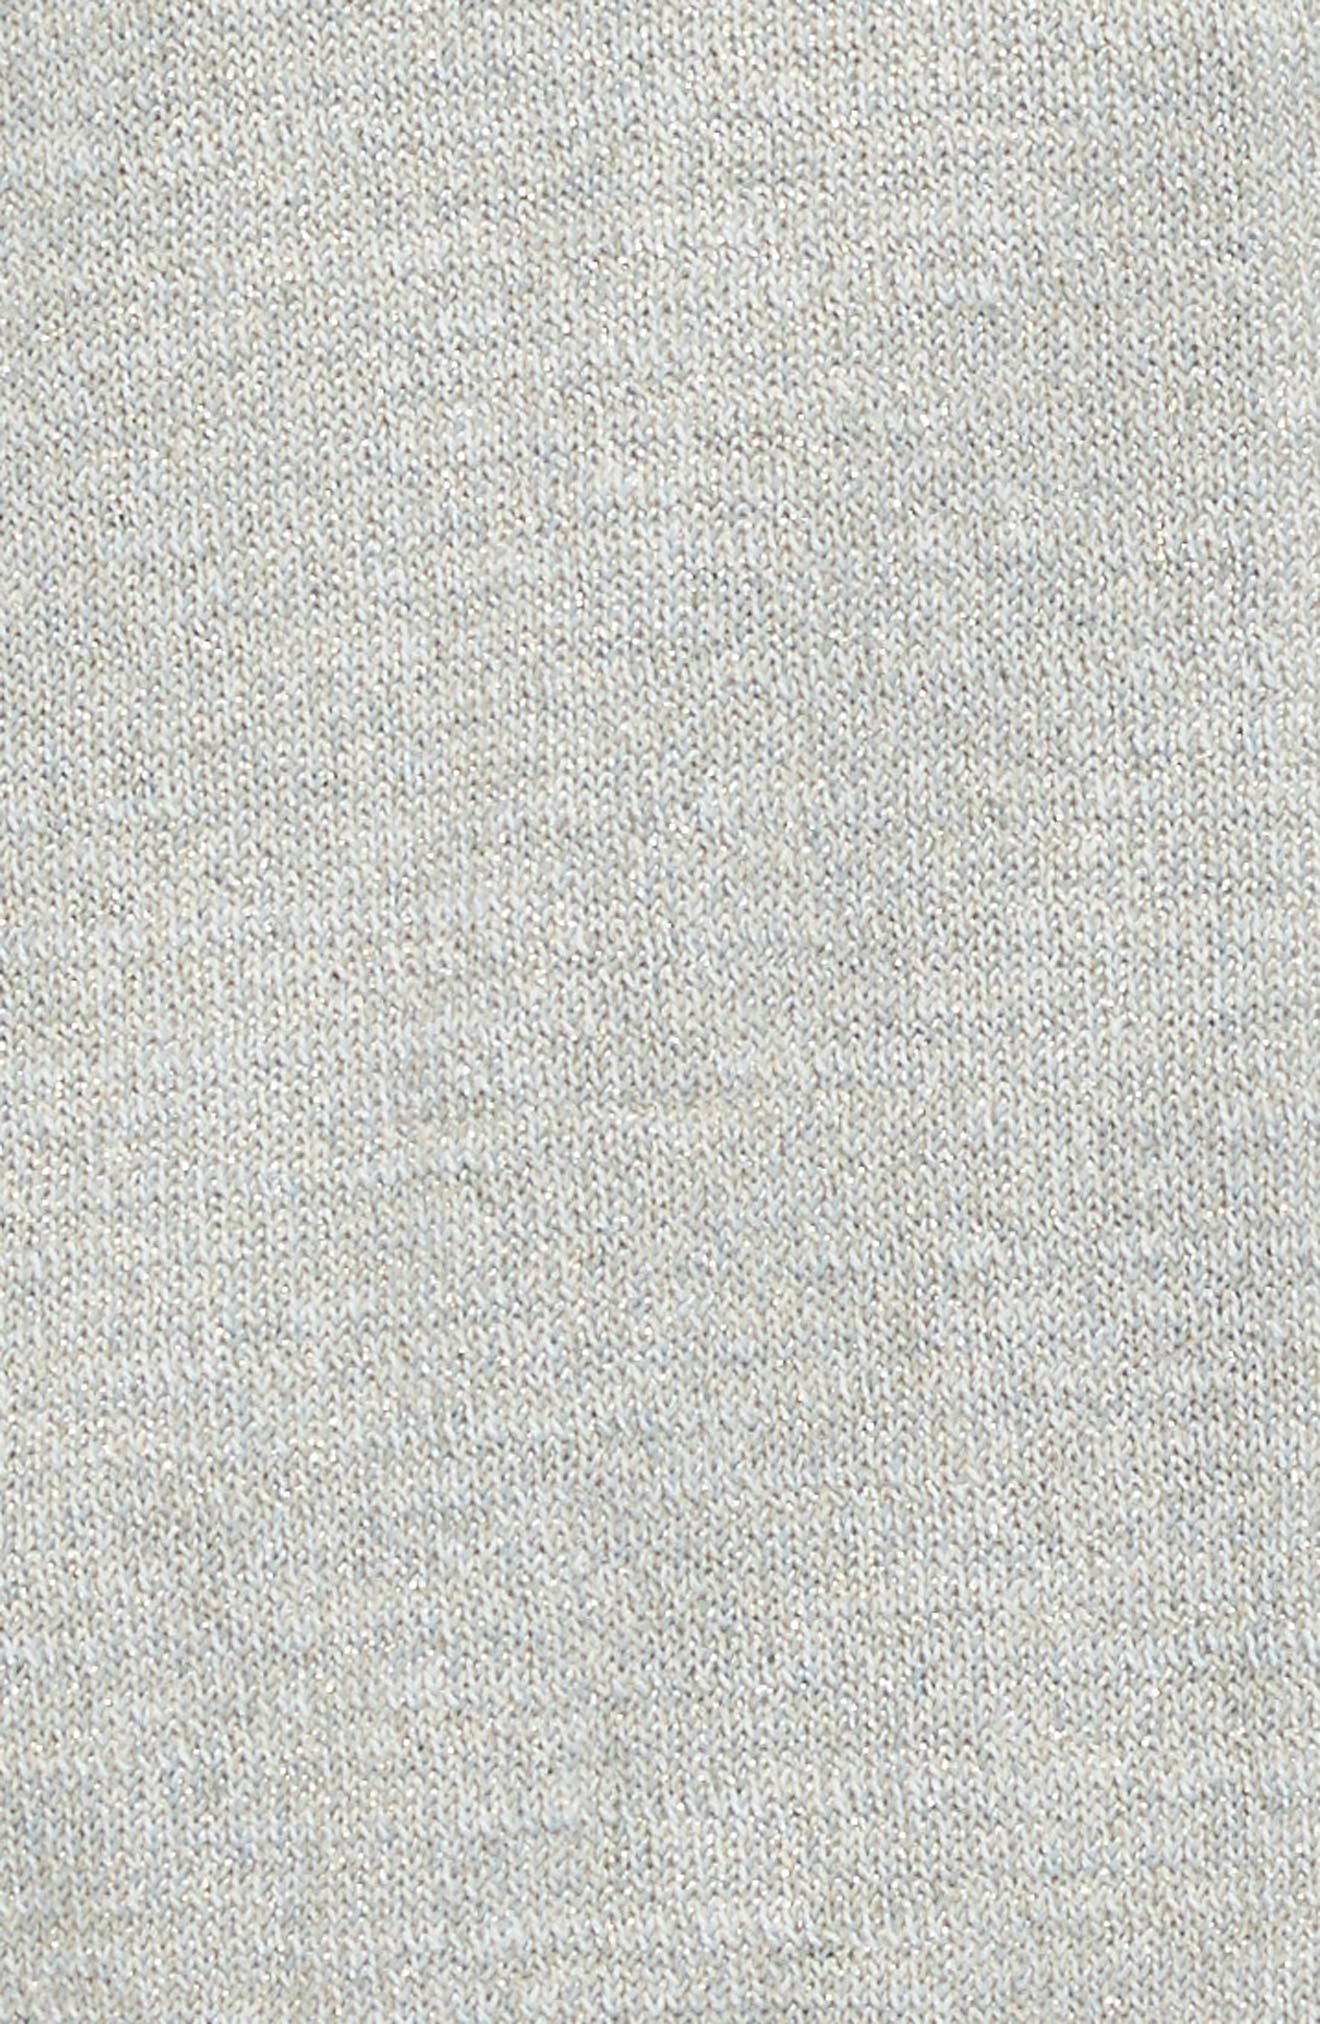 Bomber Sweater,                             Alternate thumbnail 3, color,                             Grey Sparkle